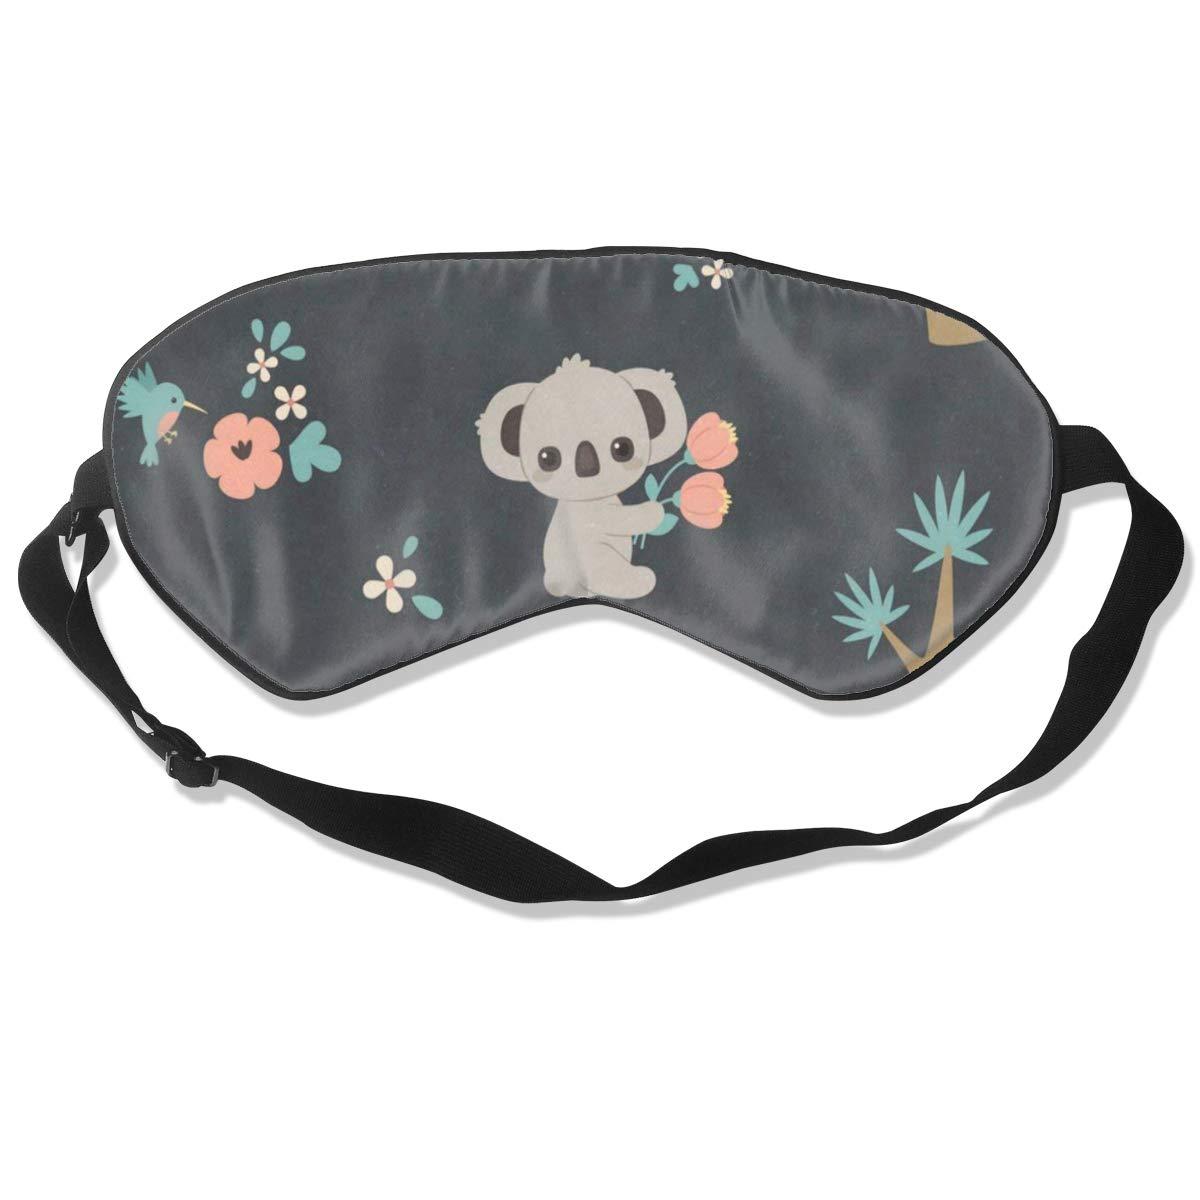 Custom Sleeping Mask Koala Laying On Branch Adjustable Breathable Sleep Mask/Sleeping Eyes Mask/Sleep Eyes Mask/Eyeshade/Blindfold